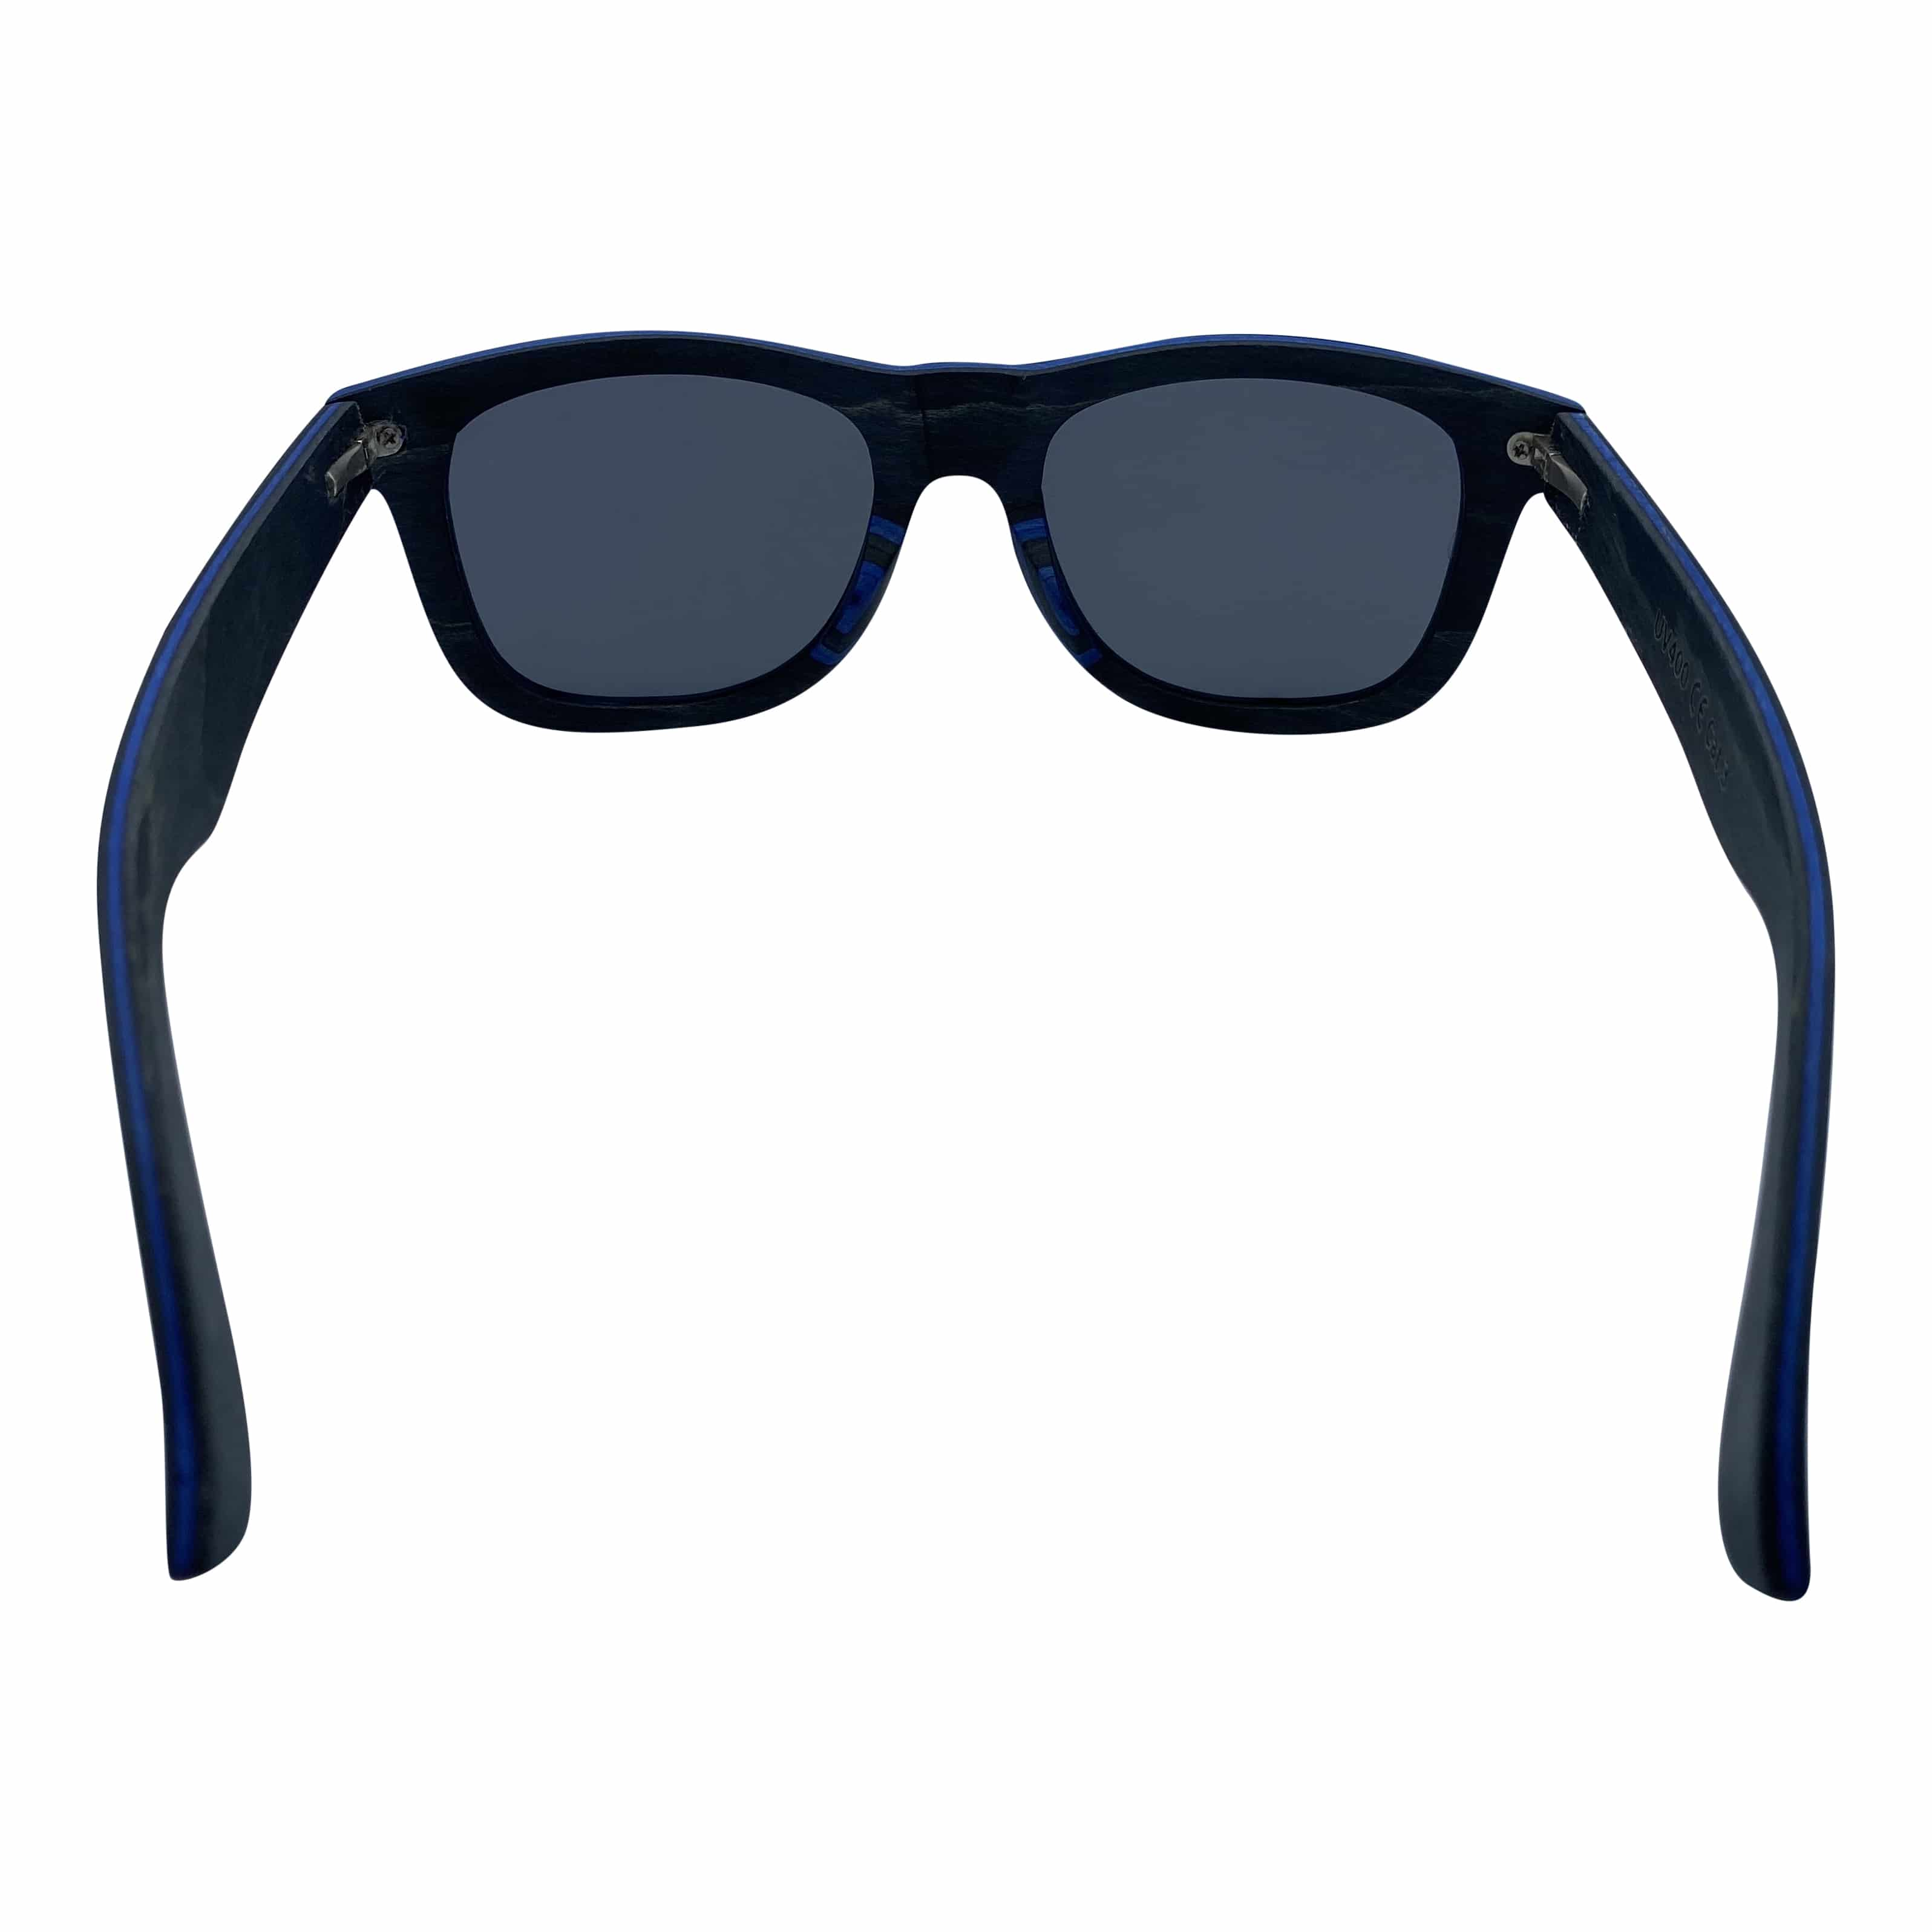 5one® wayfarer 2.0 Black/Blue - houten Zonnebril - Grijze lens